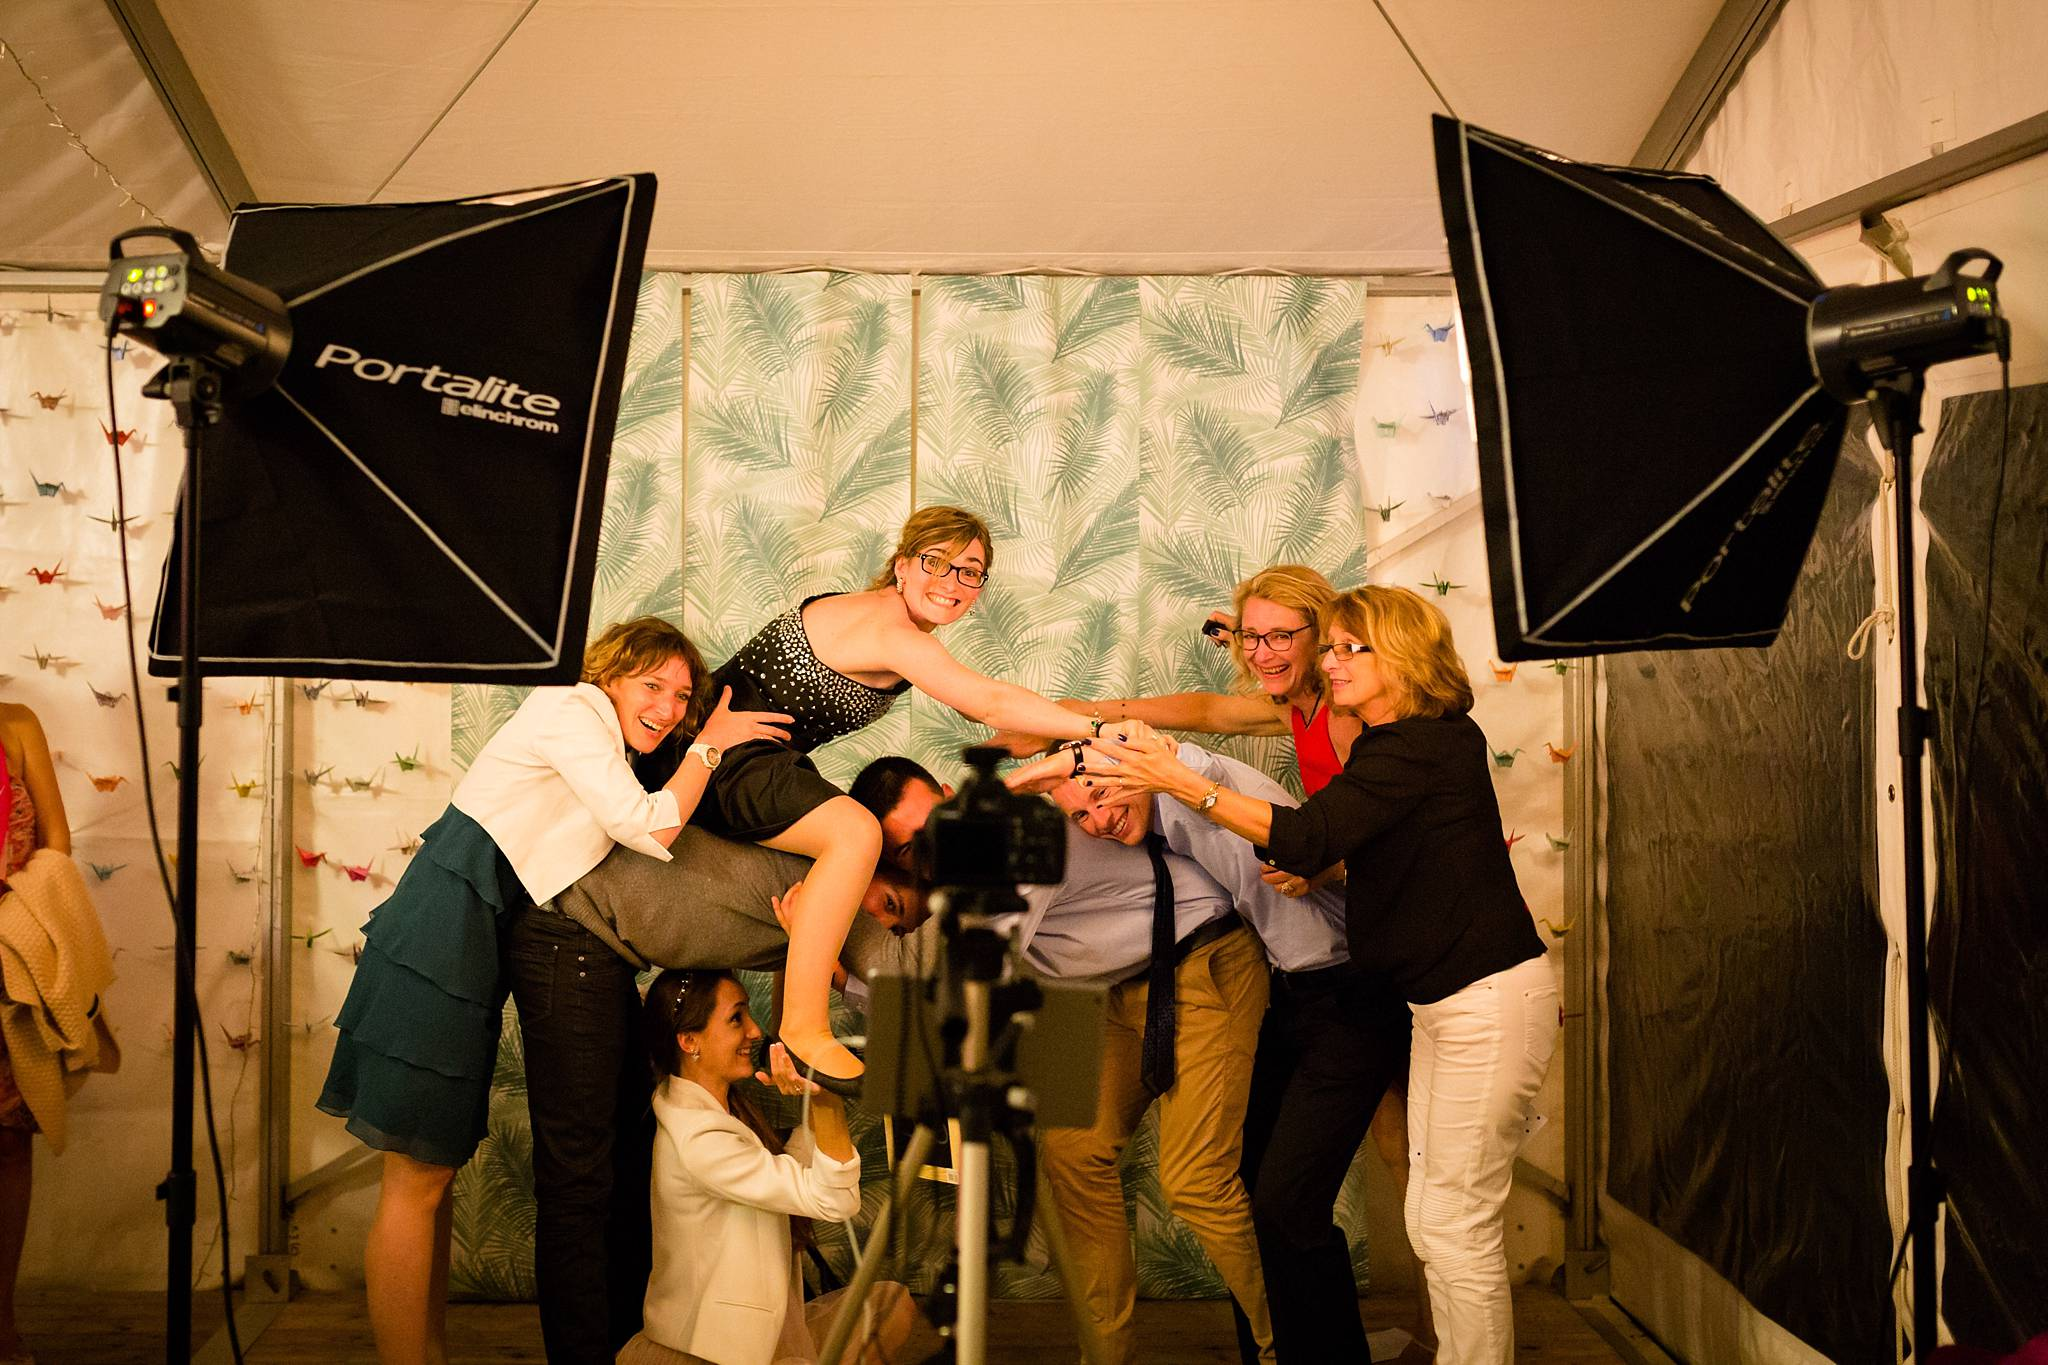 04_photobooth-mariage-backstage-bordeaux-gironde-dordogne-charentes-alexandre-roschewitz-photographies_2048px